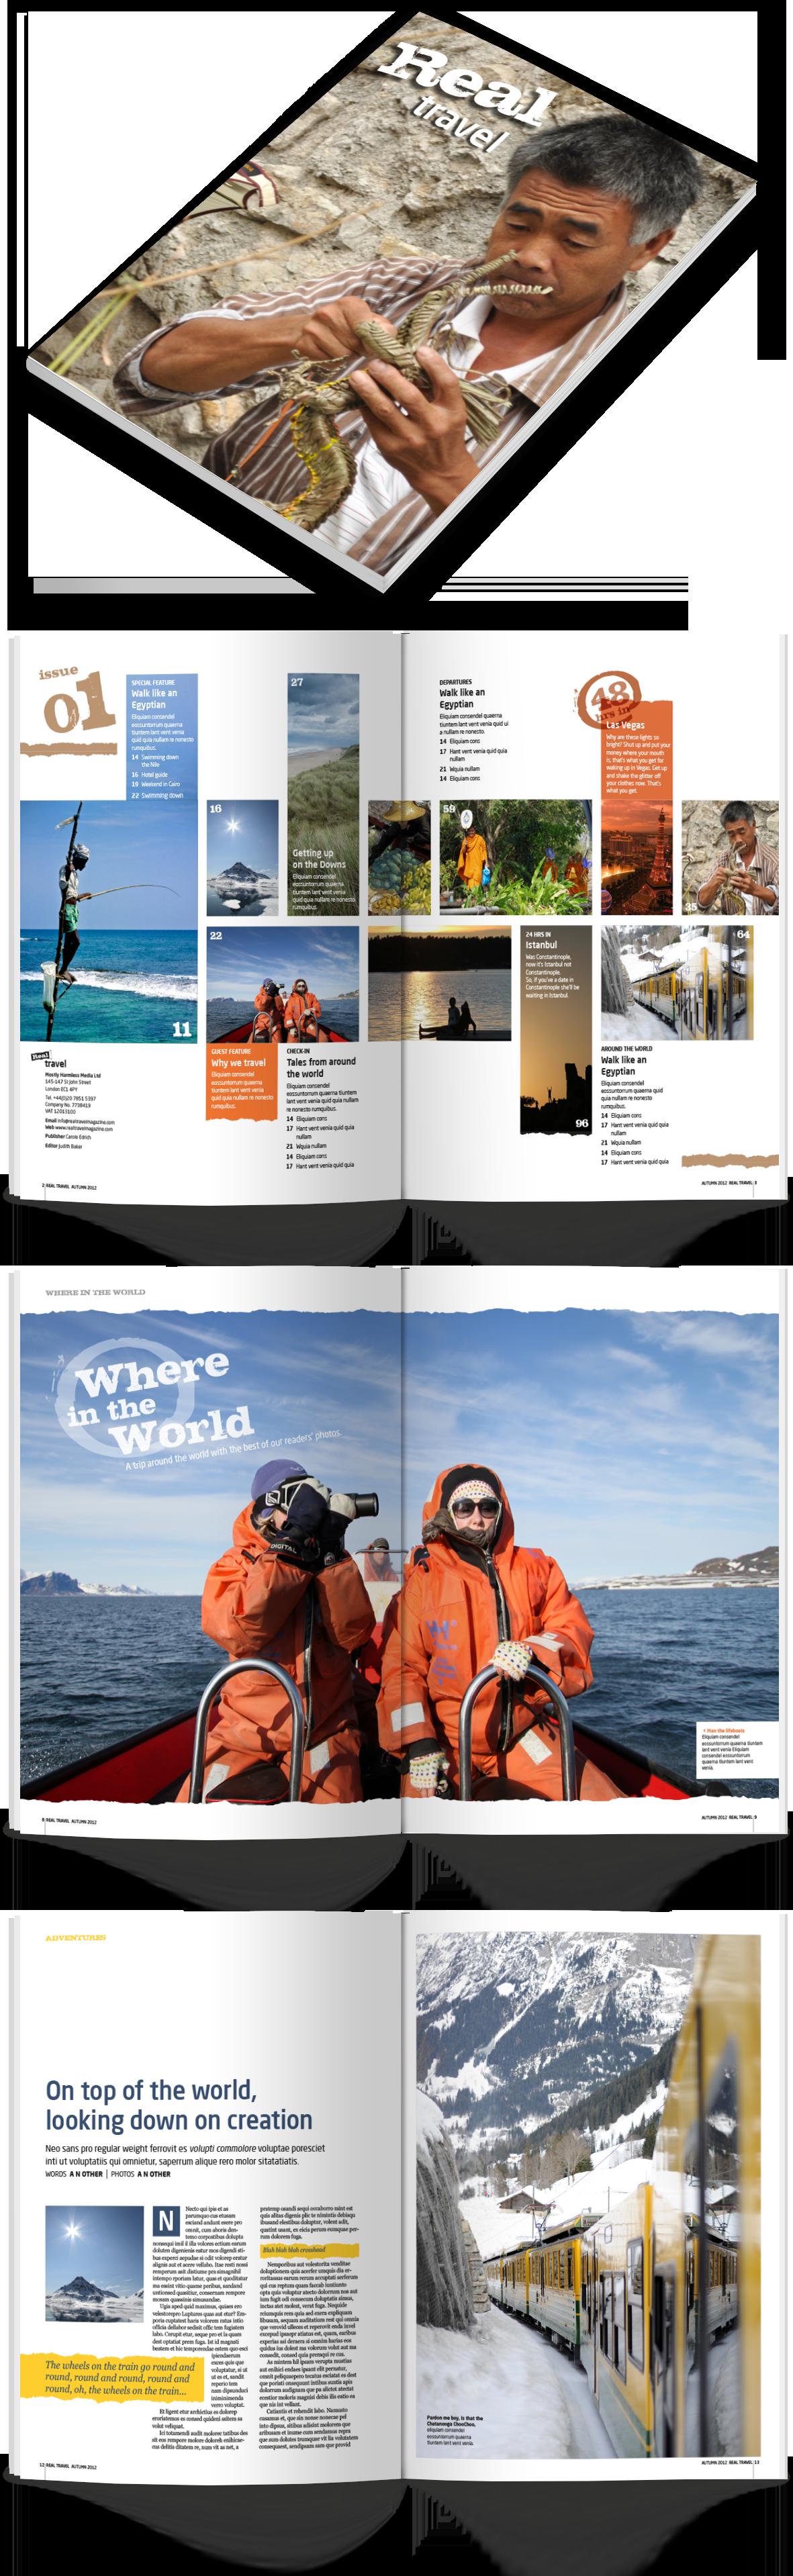 Real Travel magazine